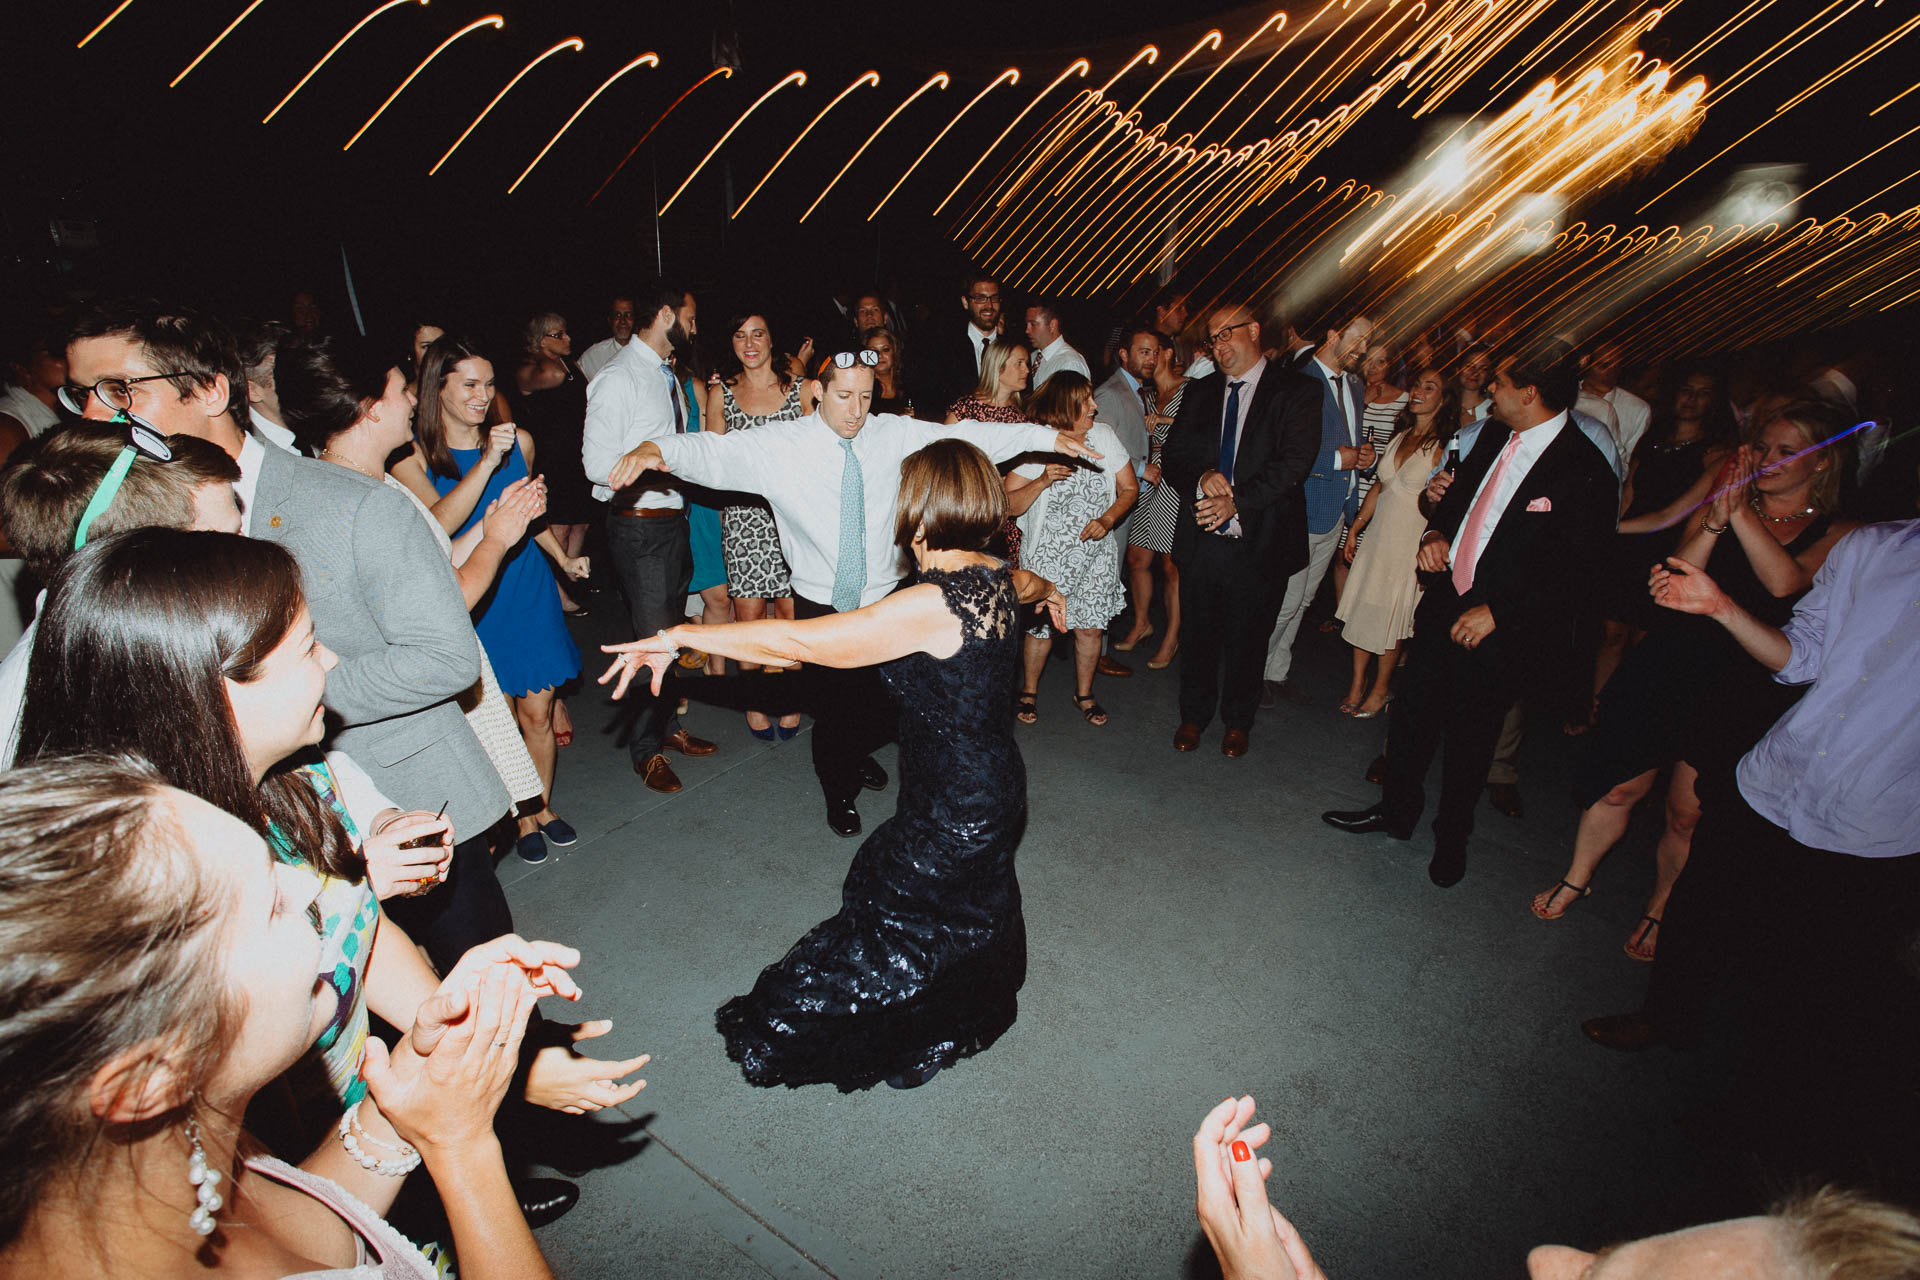 Keri-Joseph-Top-of-the-Market-Wedding-202@2x.jpg